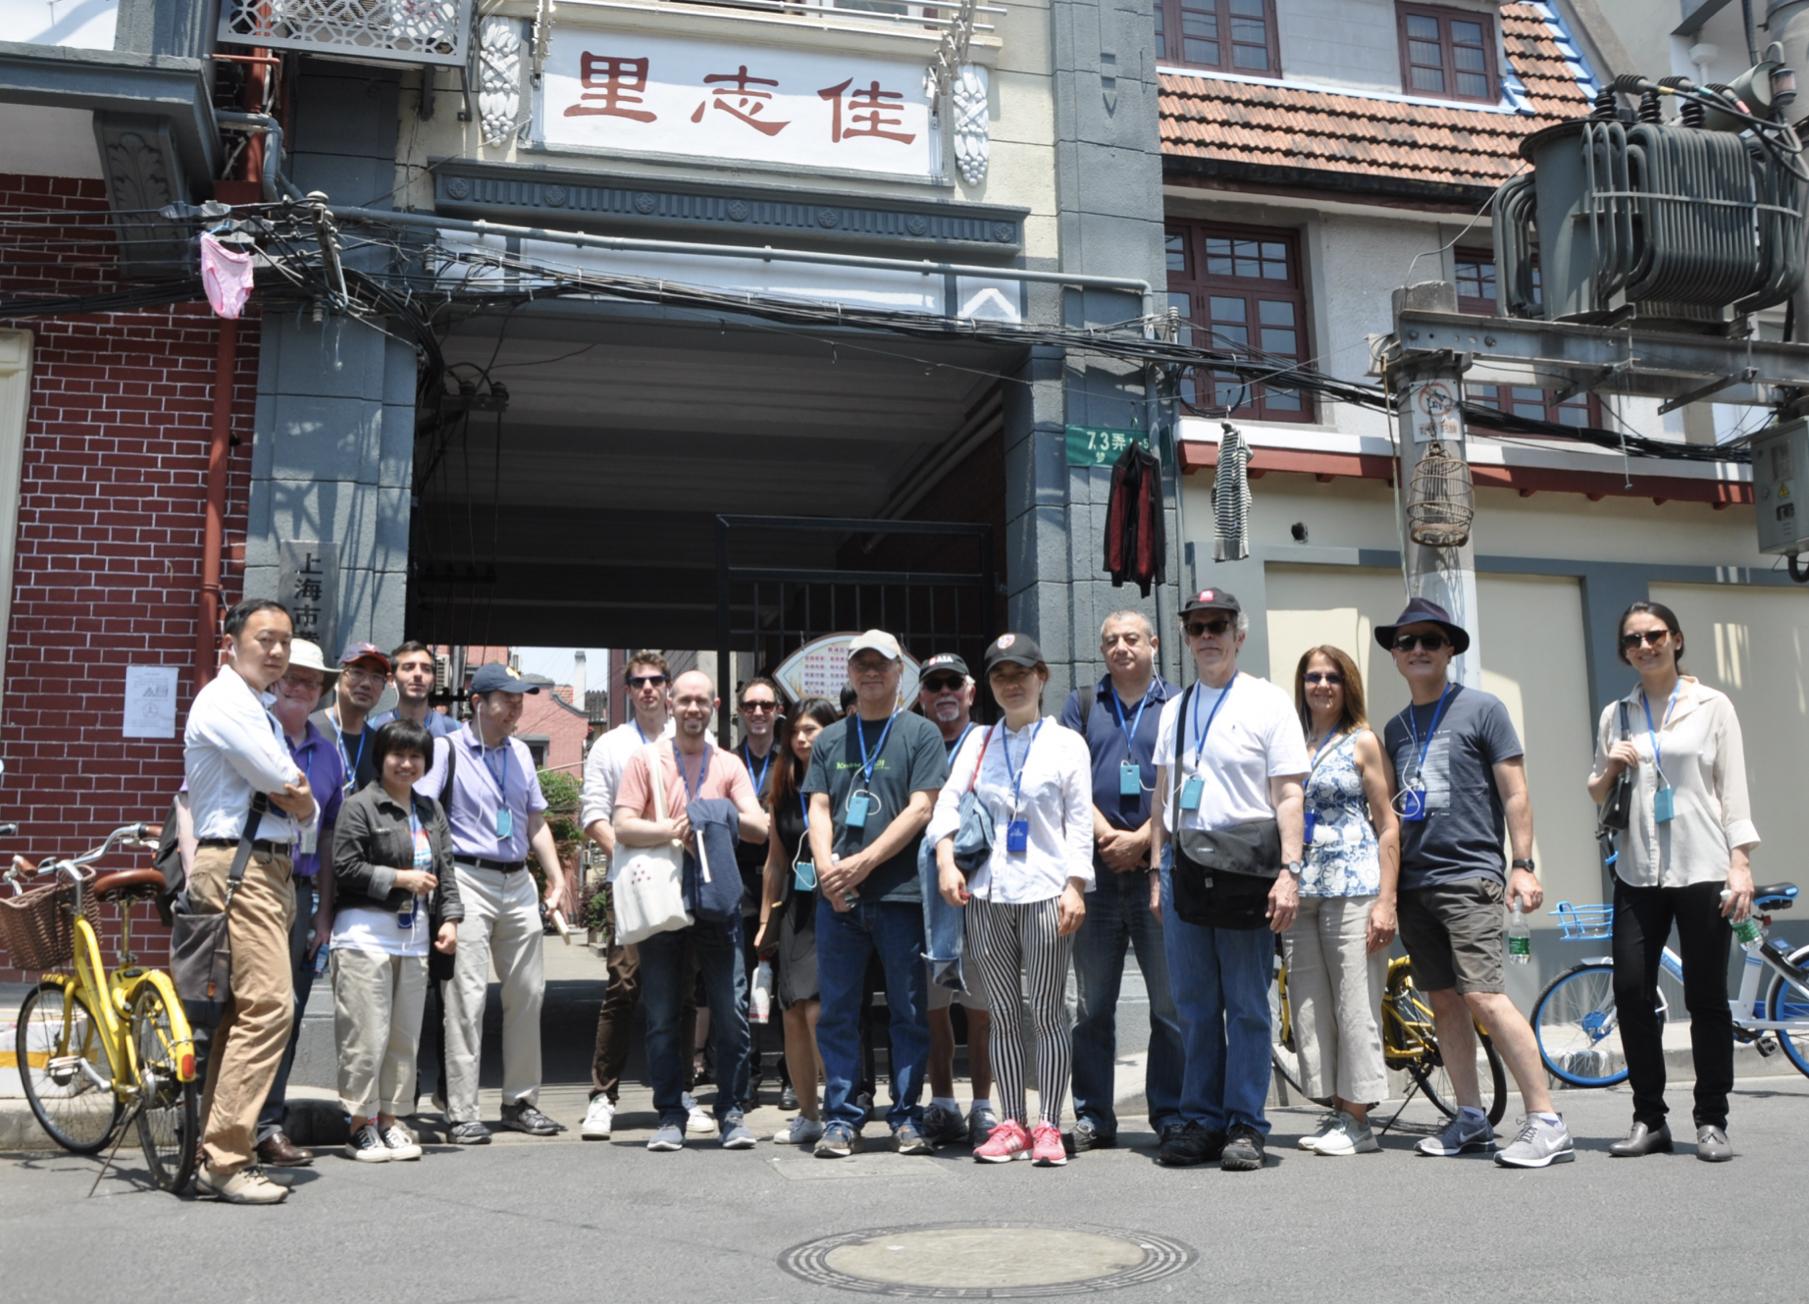 shang wlkg tour.jpg